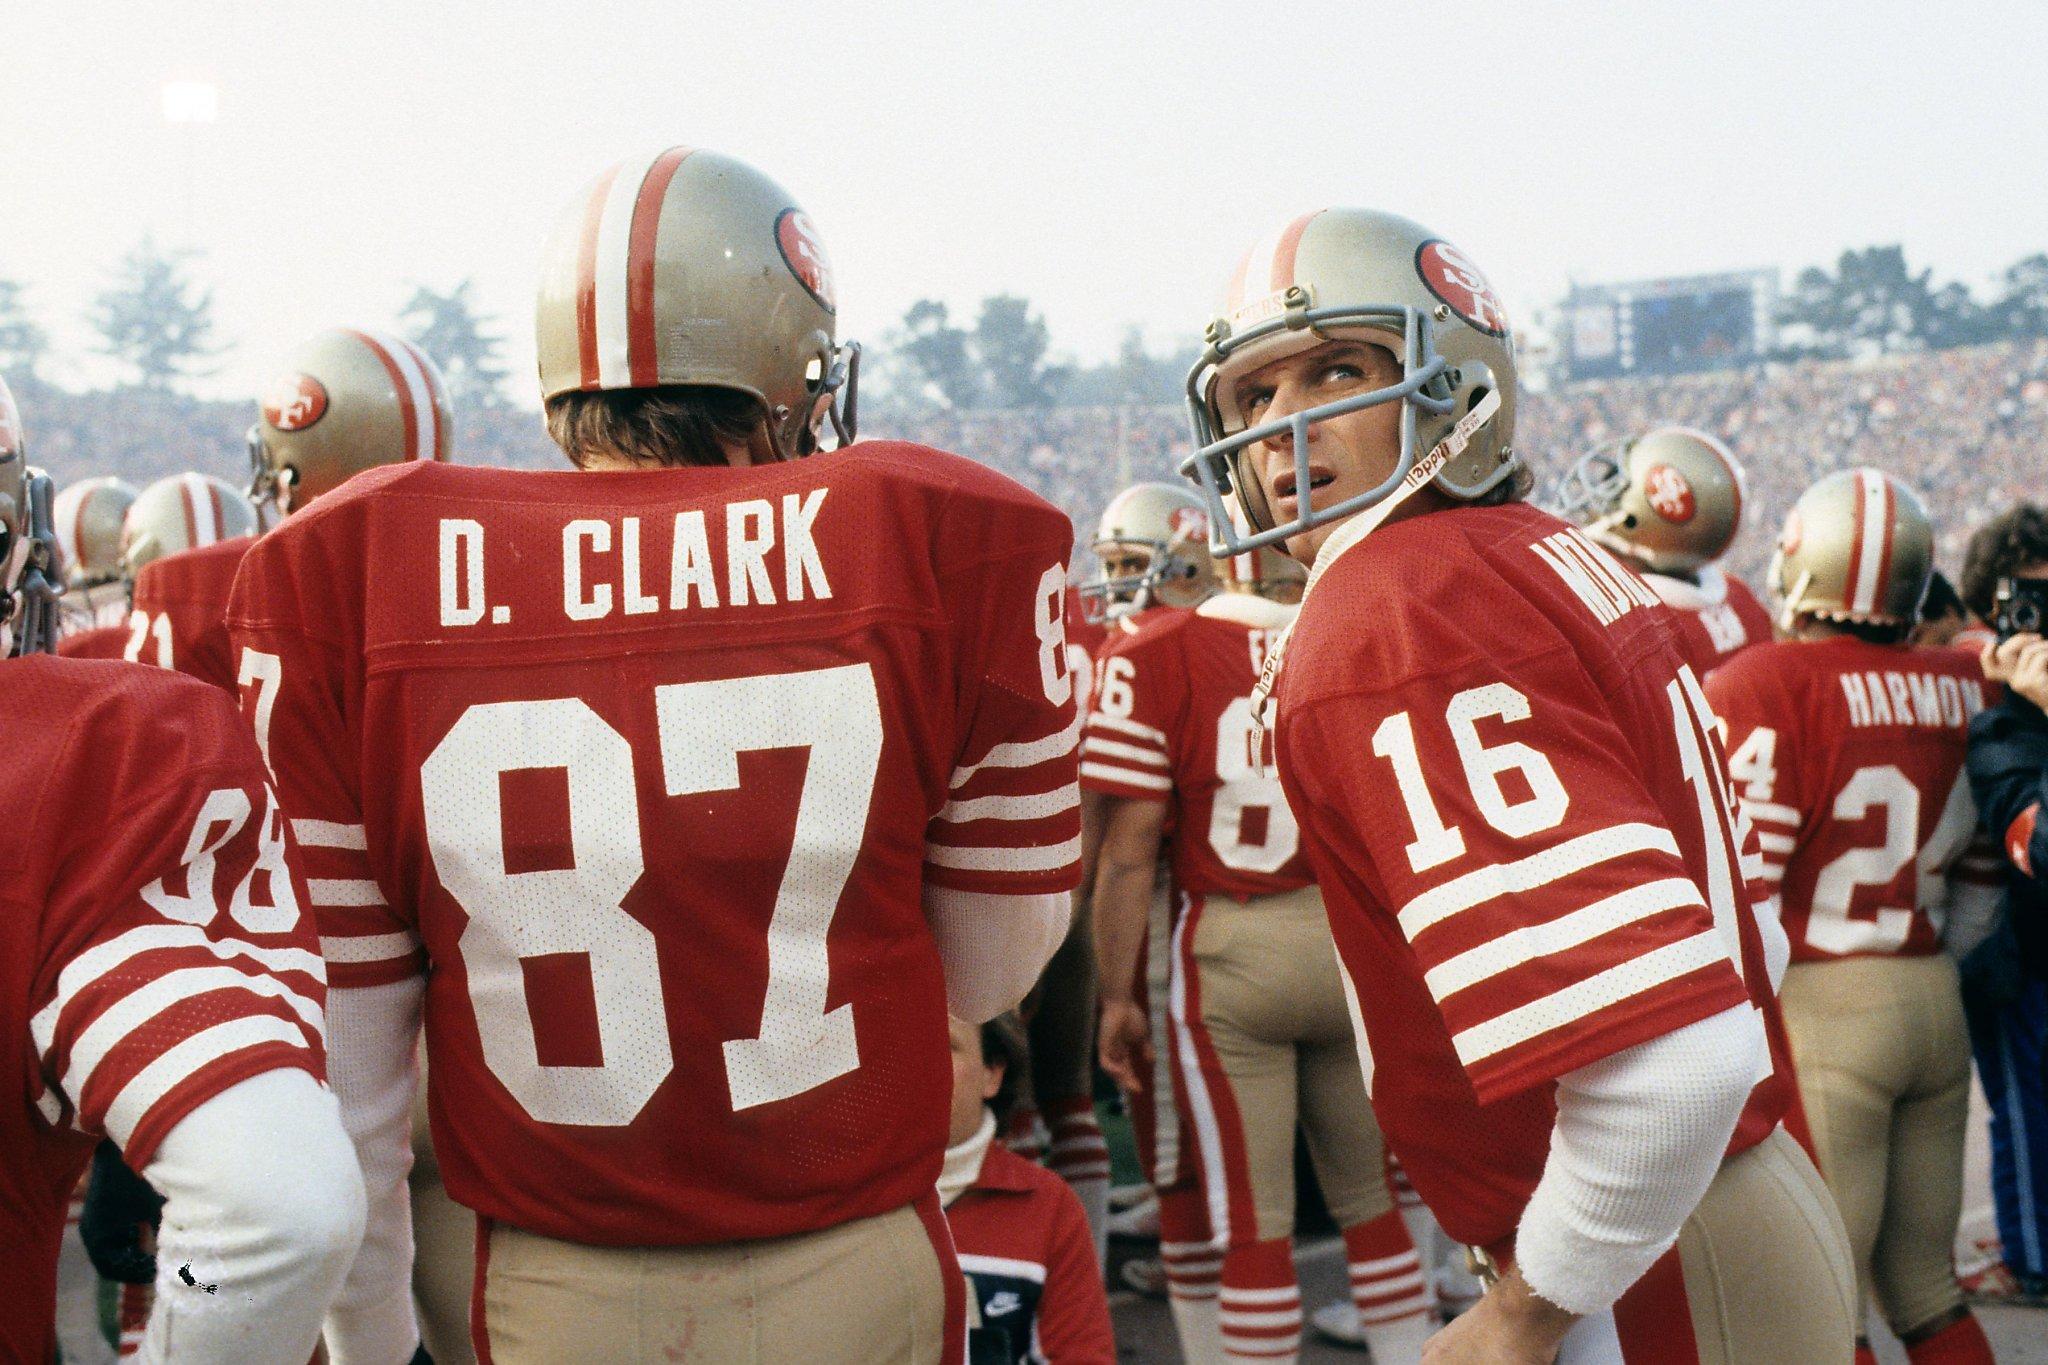 dwight clark jersey